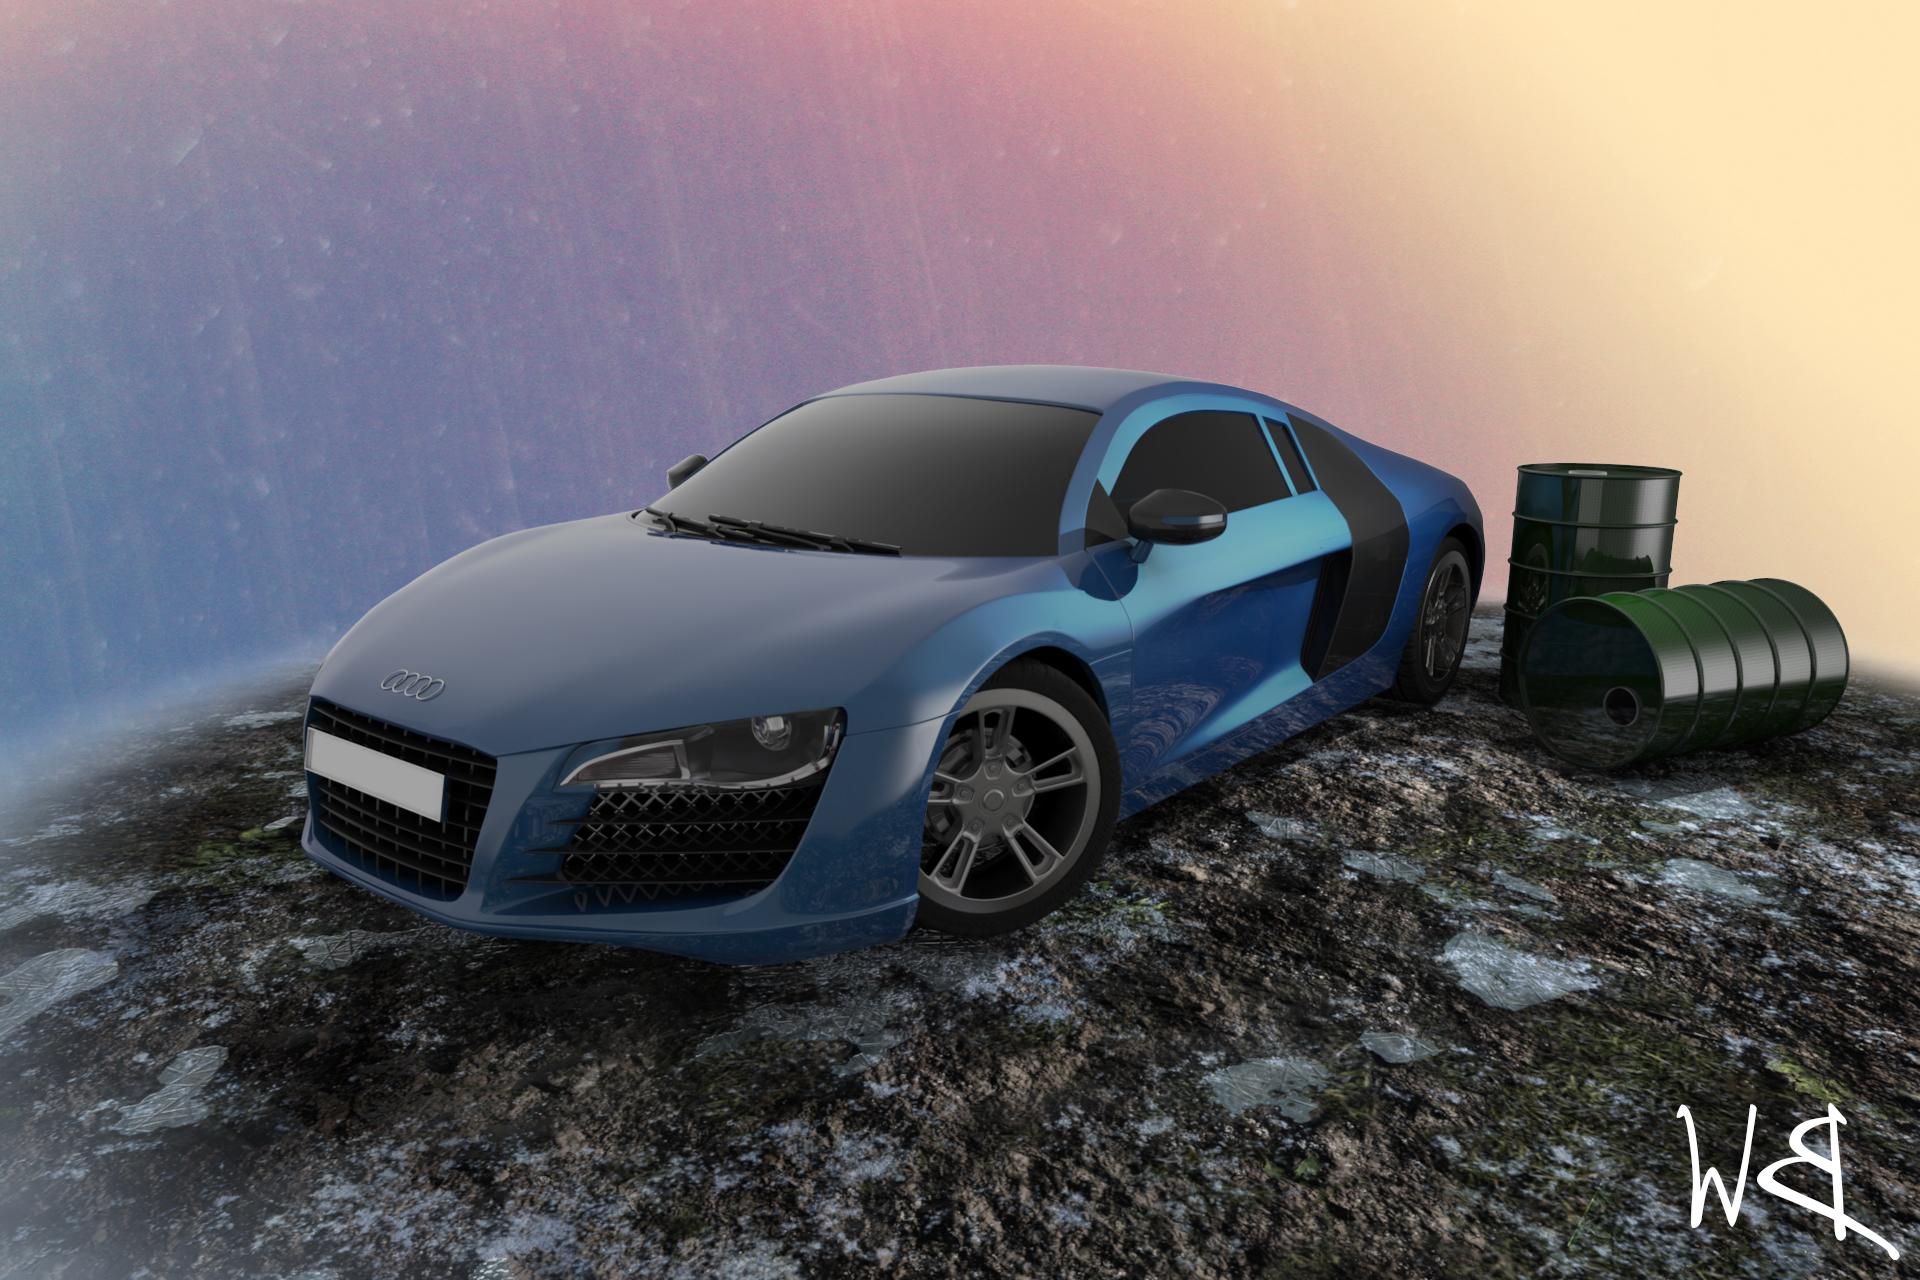 Audi R8 by Bahr3DCG